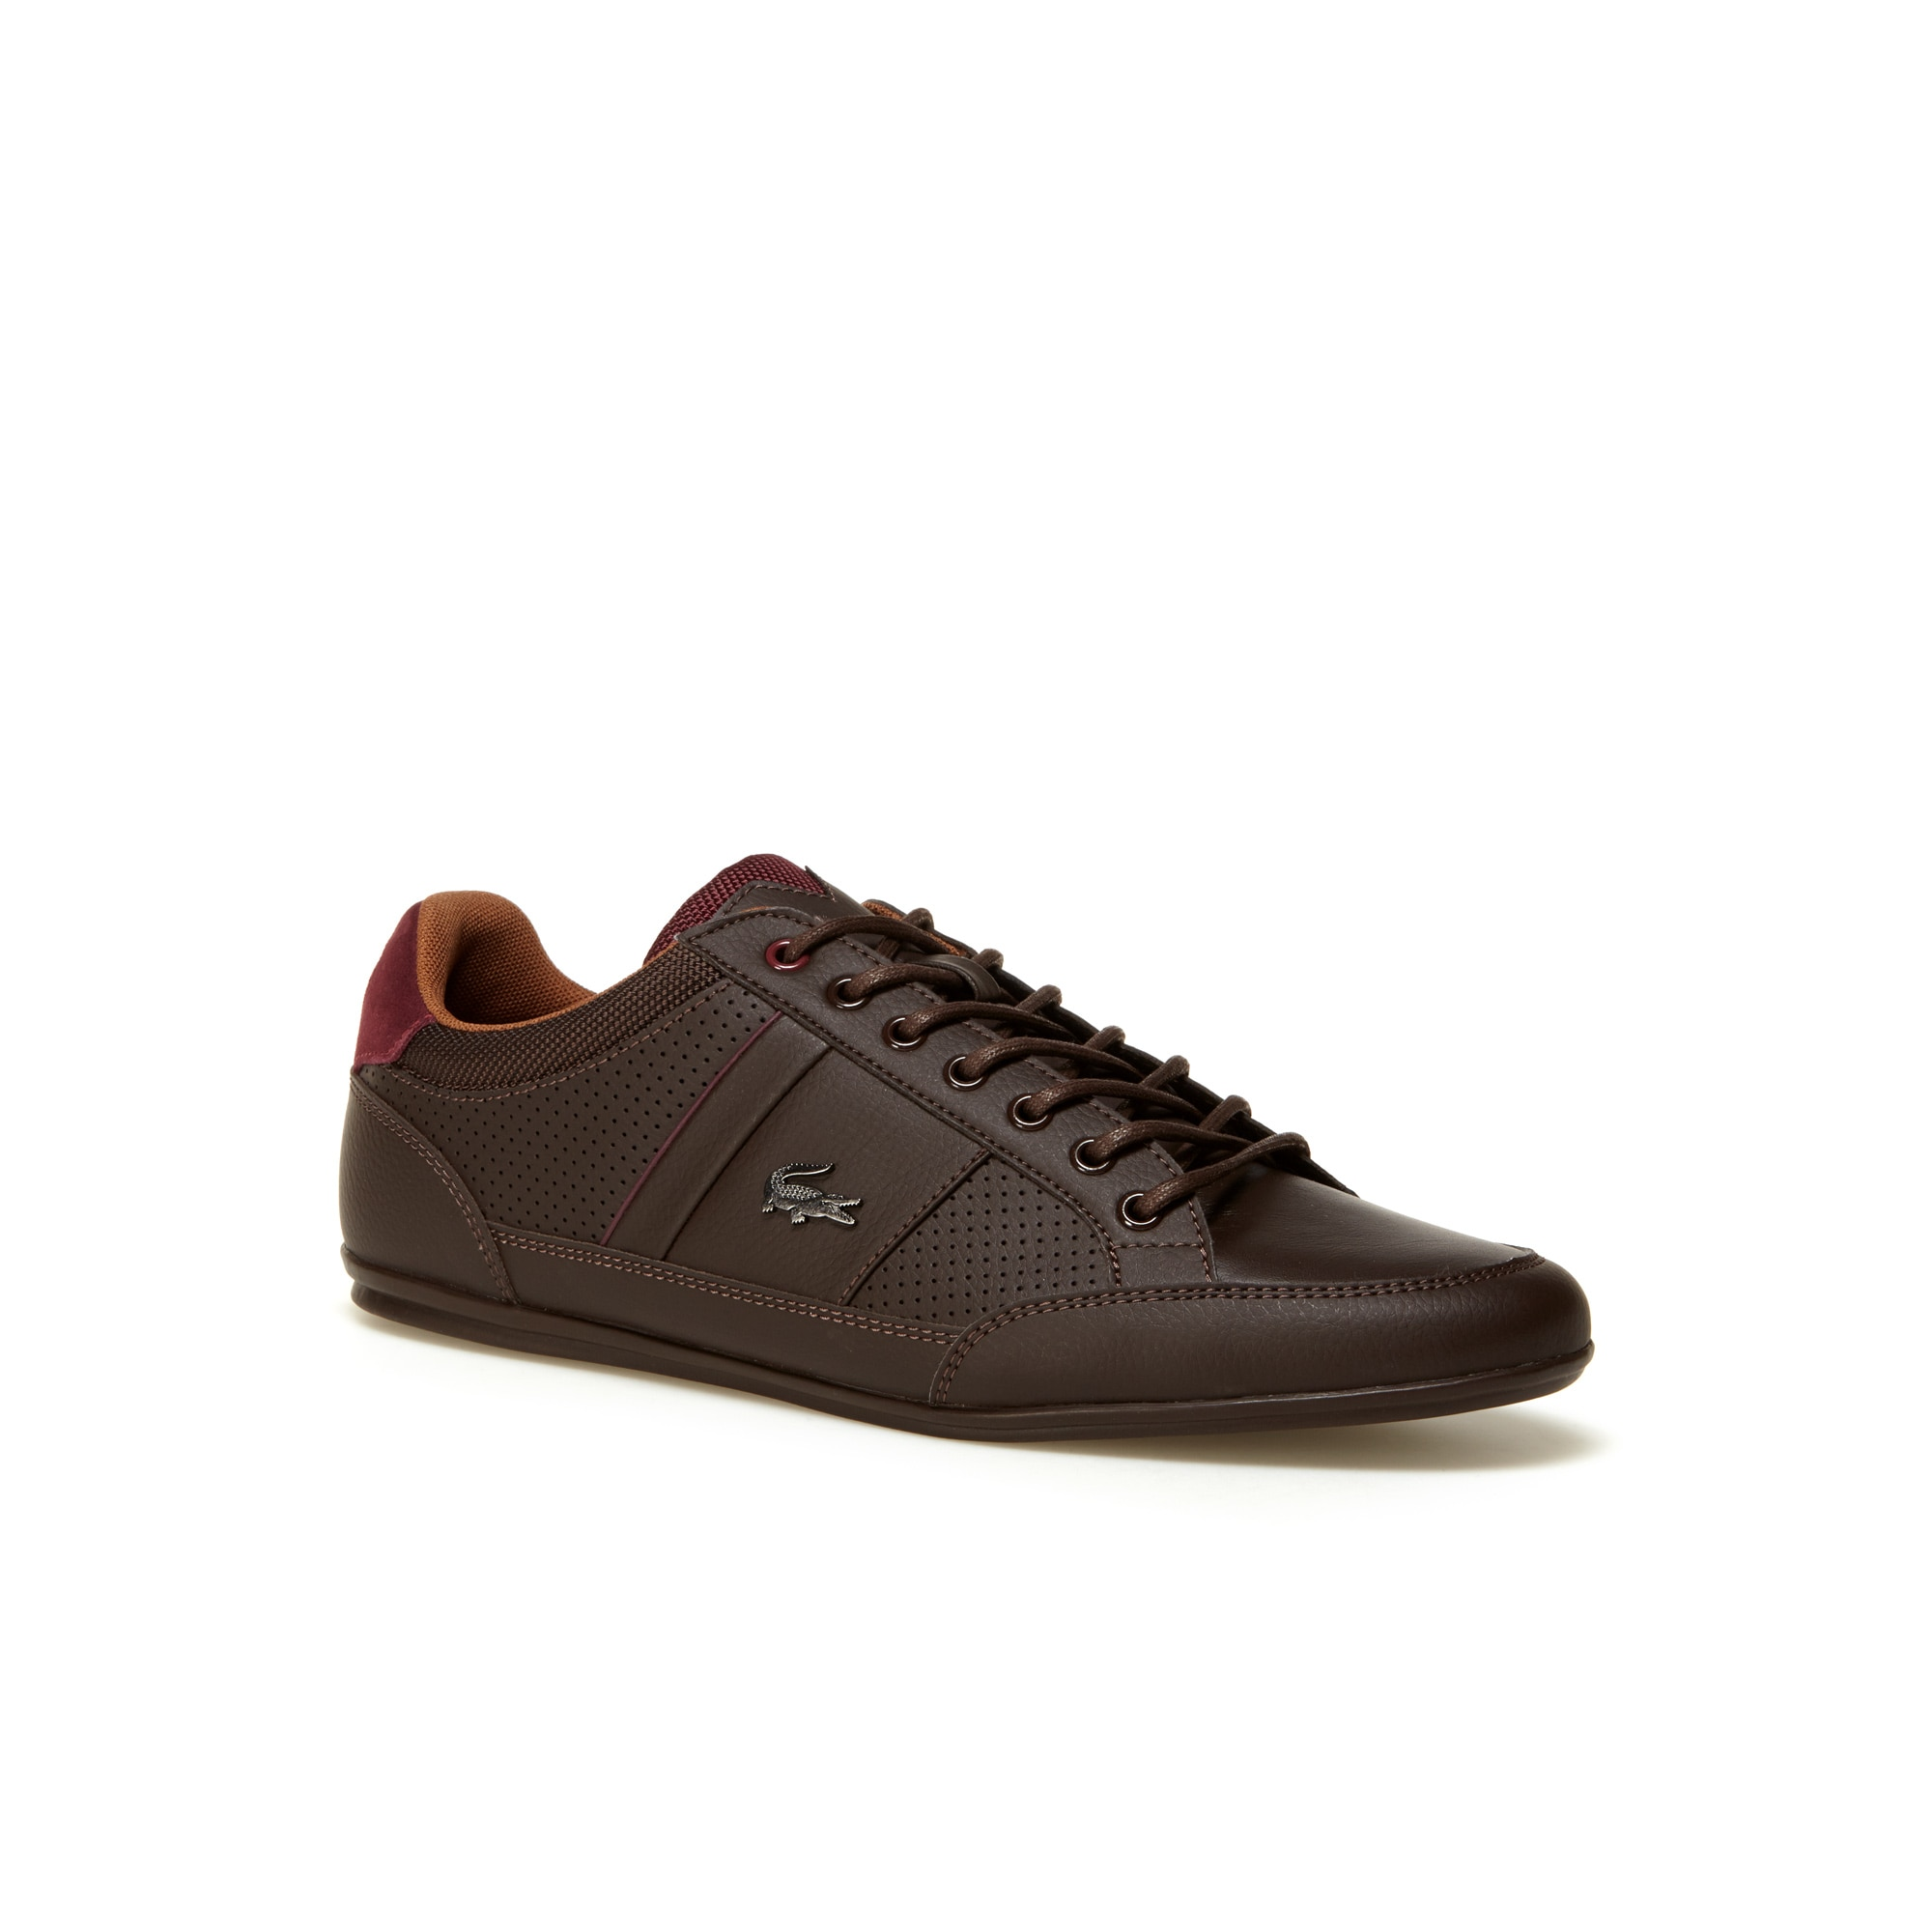 men 39 s shoes shoes for men lacoste. Black Bedroom Furniture Sets. Home Design Ideas